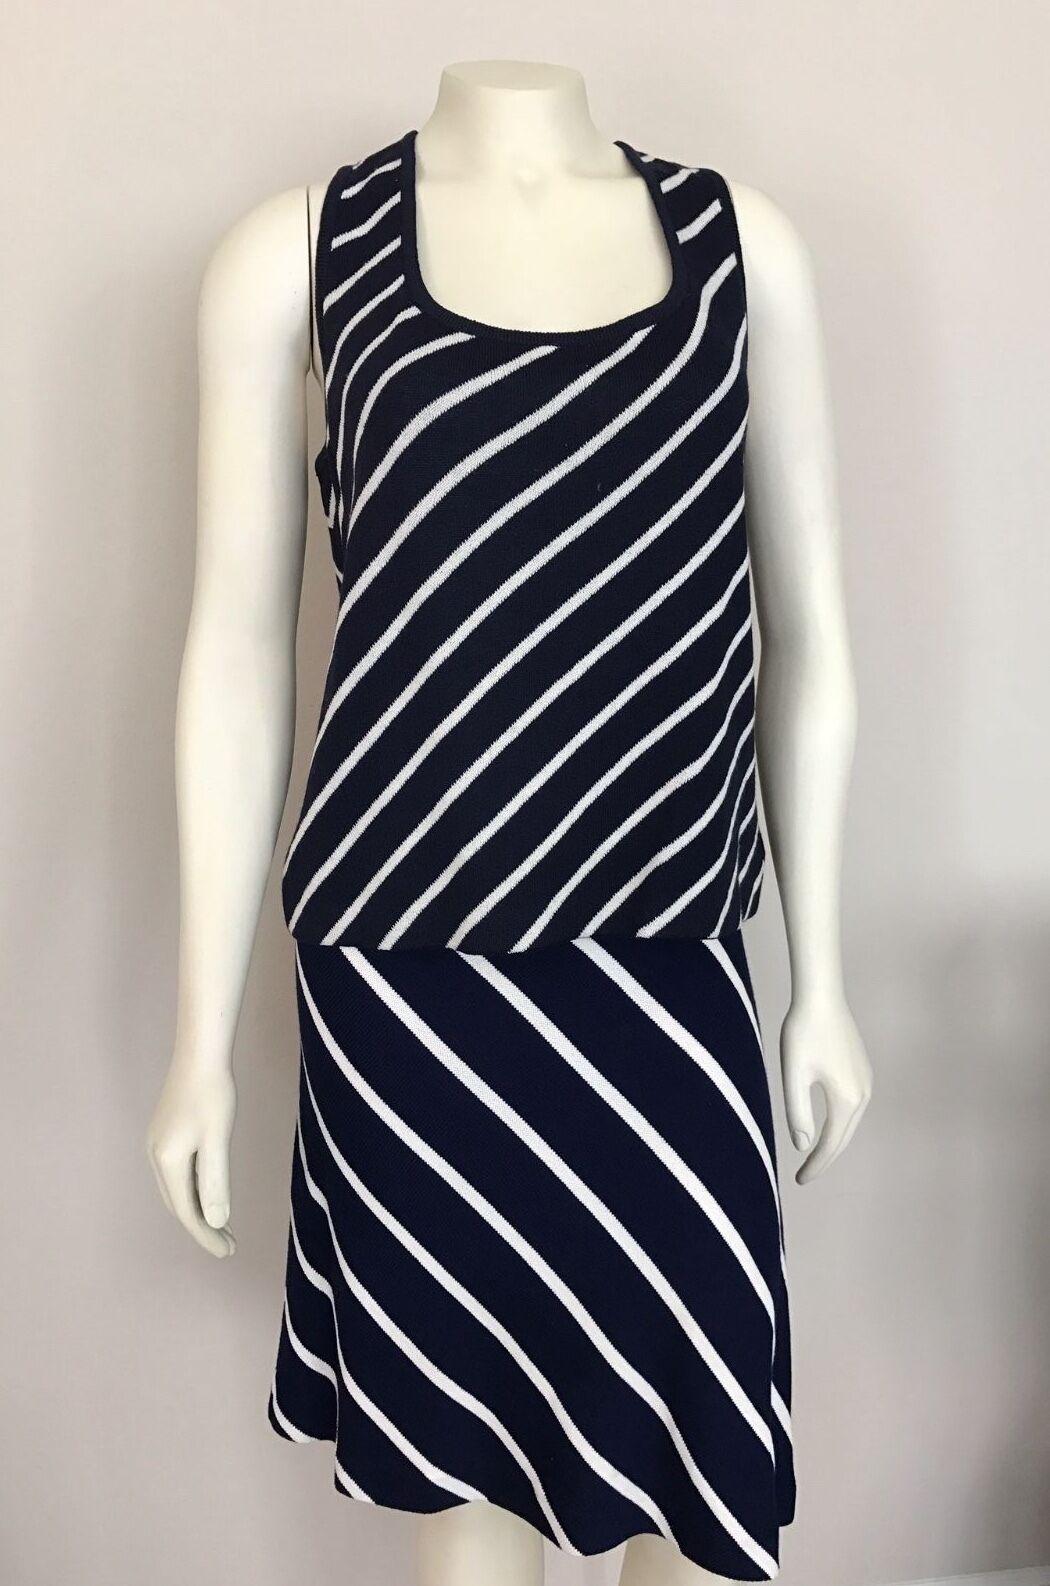 ST. JOHN Navy Blau & Weiß Diagonal Striped Tank Top Größe S & Skirt Größe 6 Set